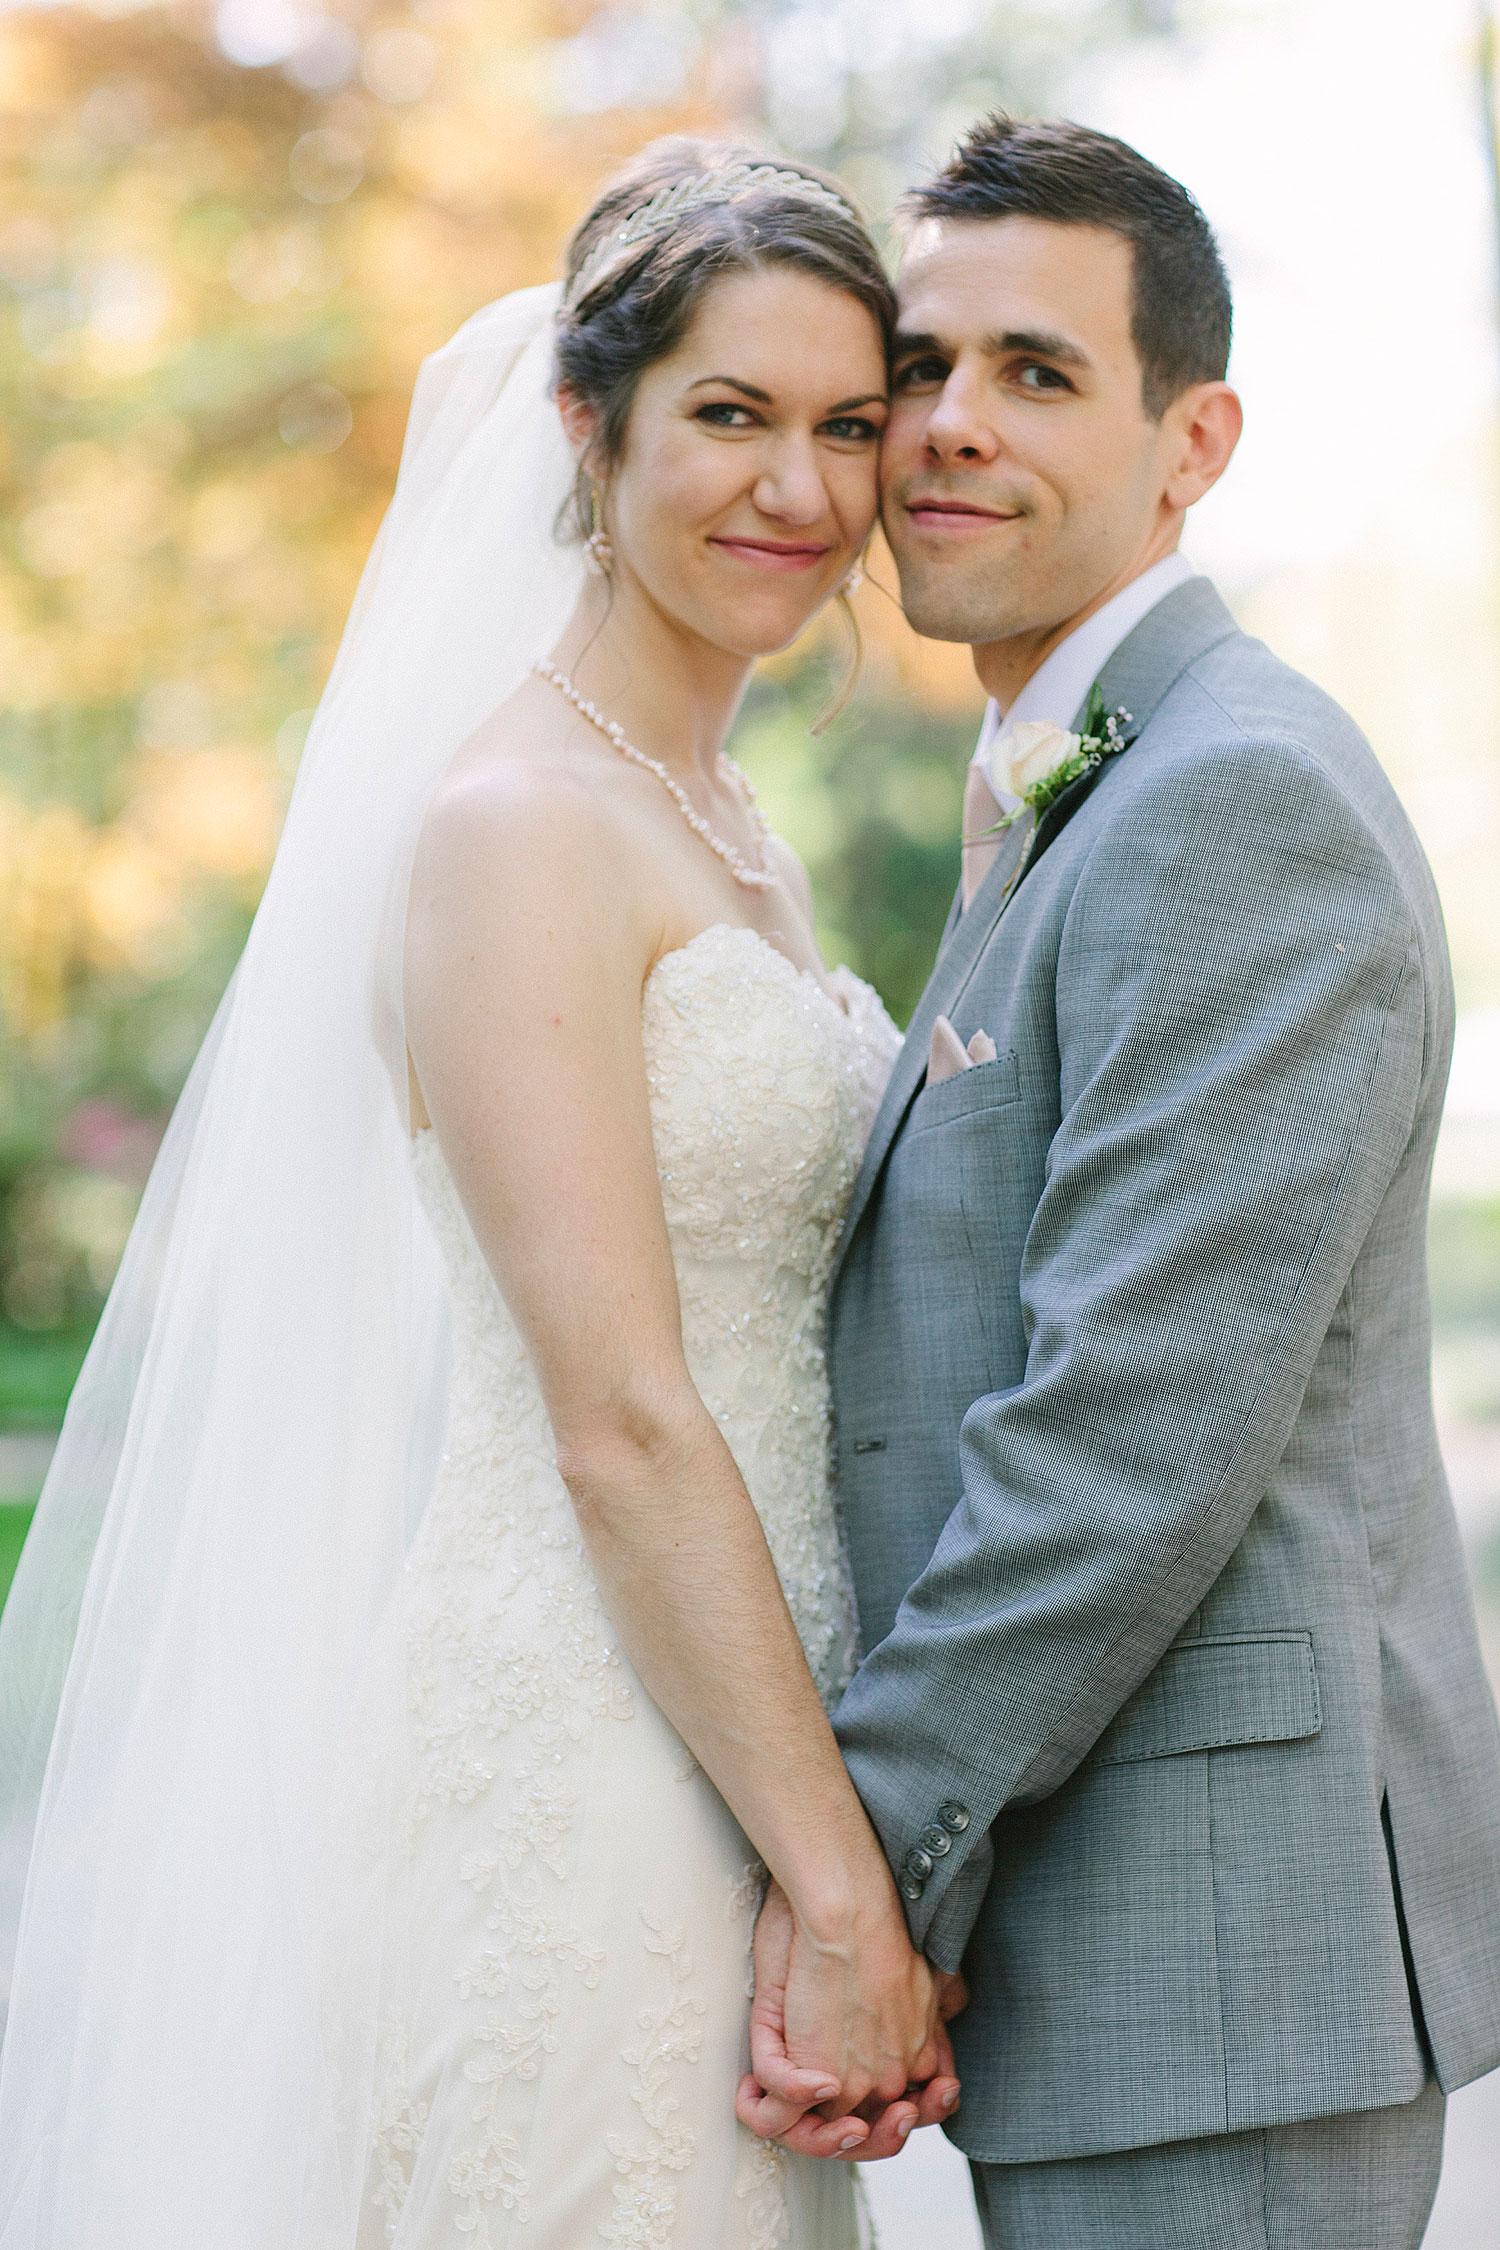 Callahan_Wedding150411_1416.jpg